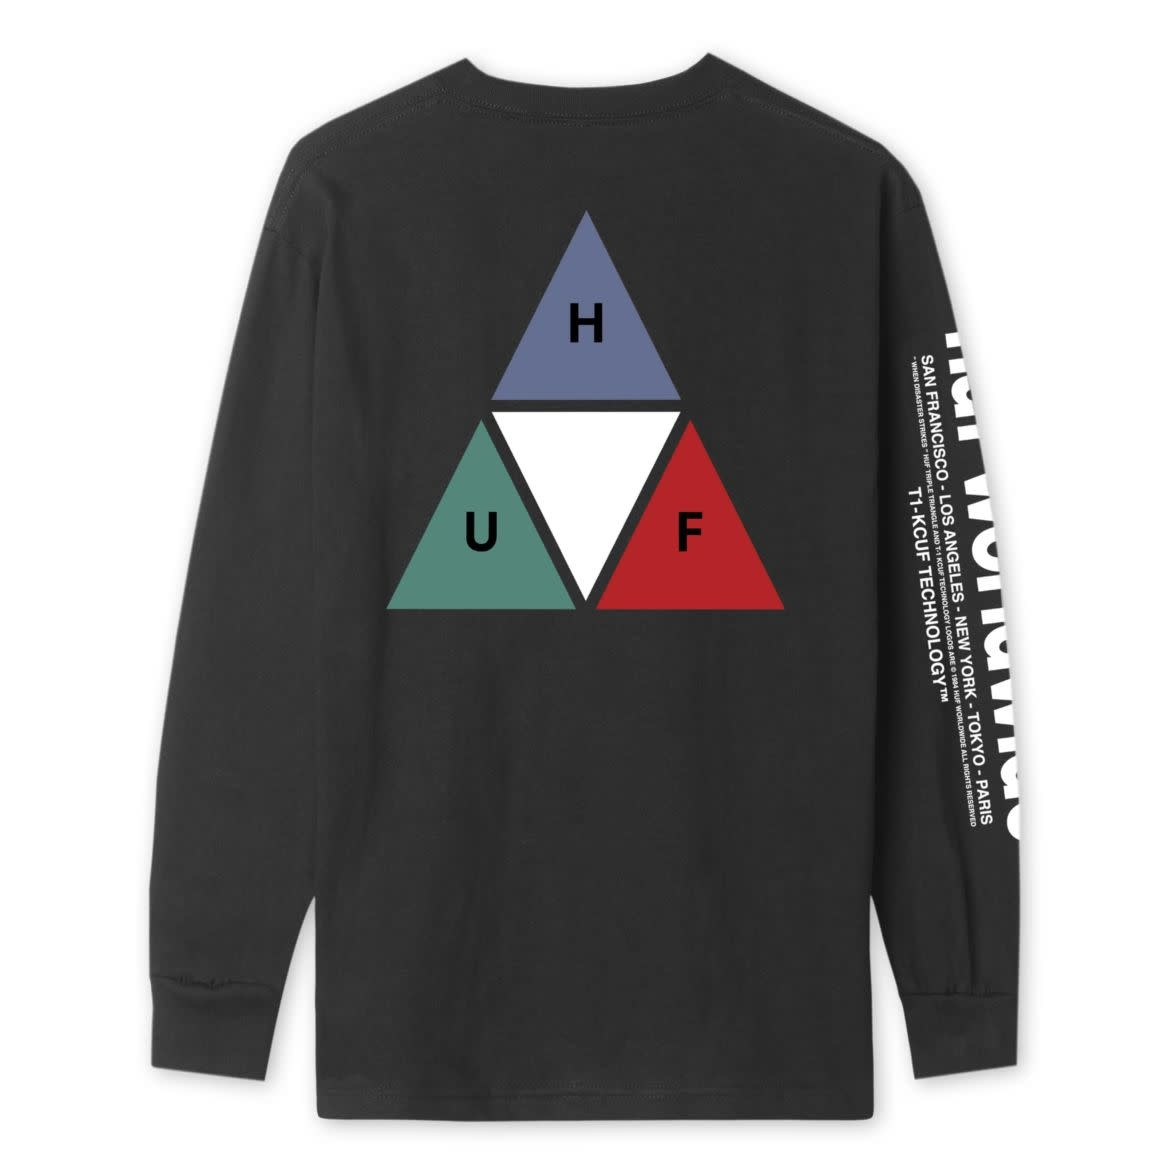 HUF Huf Prism Triple Triangle Longsleeve - Black